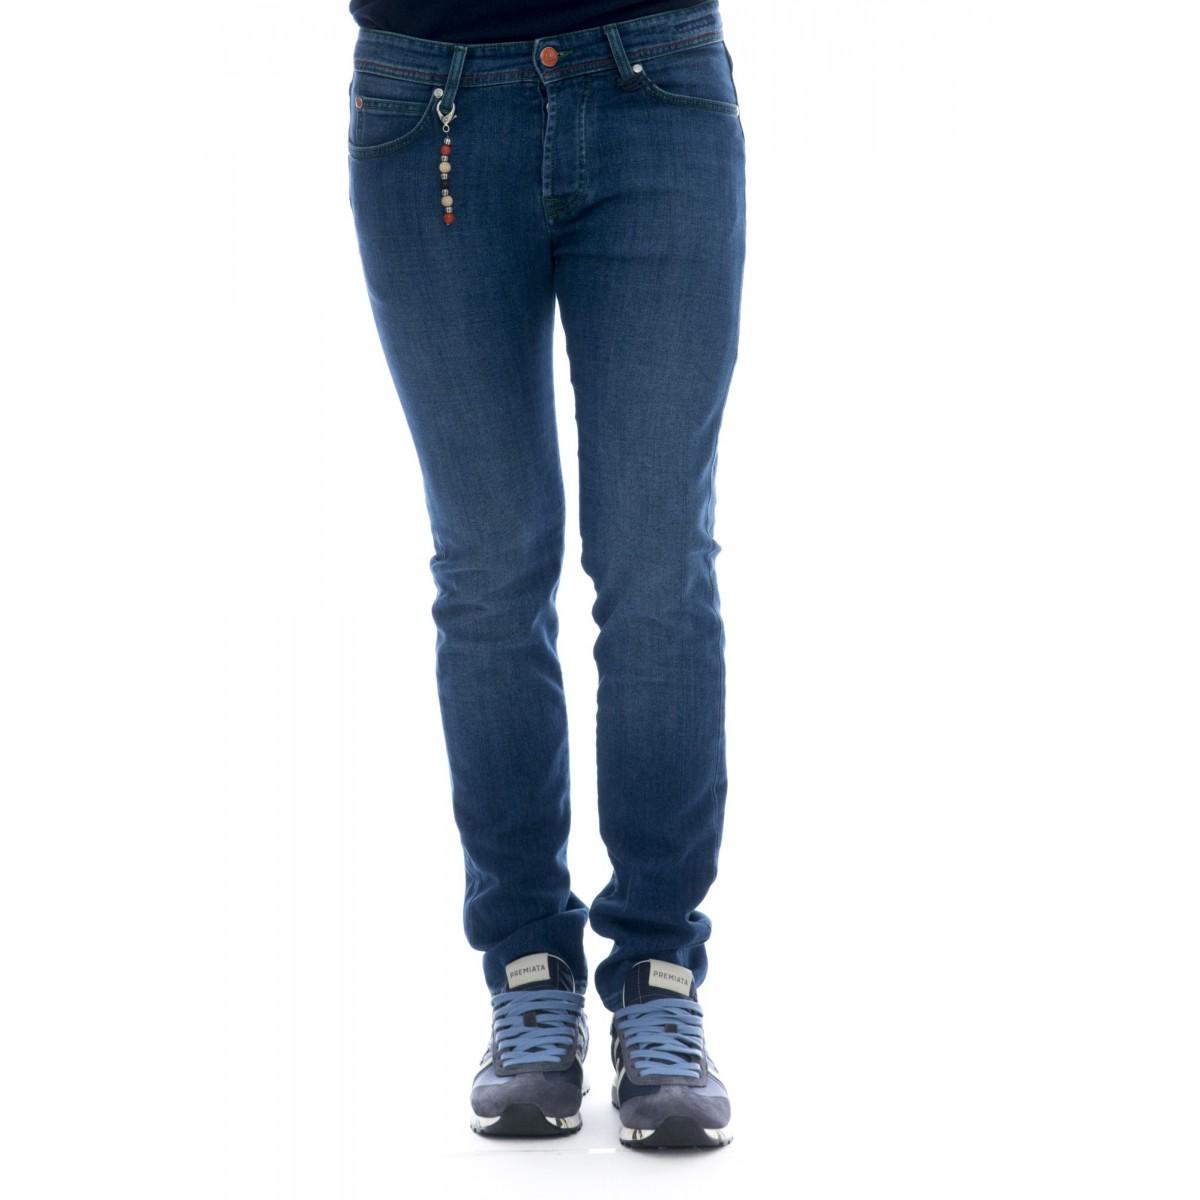 Jeans - Rrs 529 aim jeans special salpa